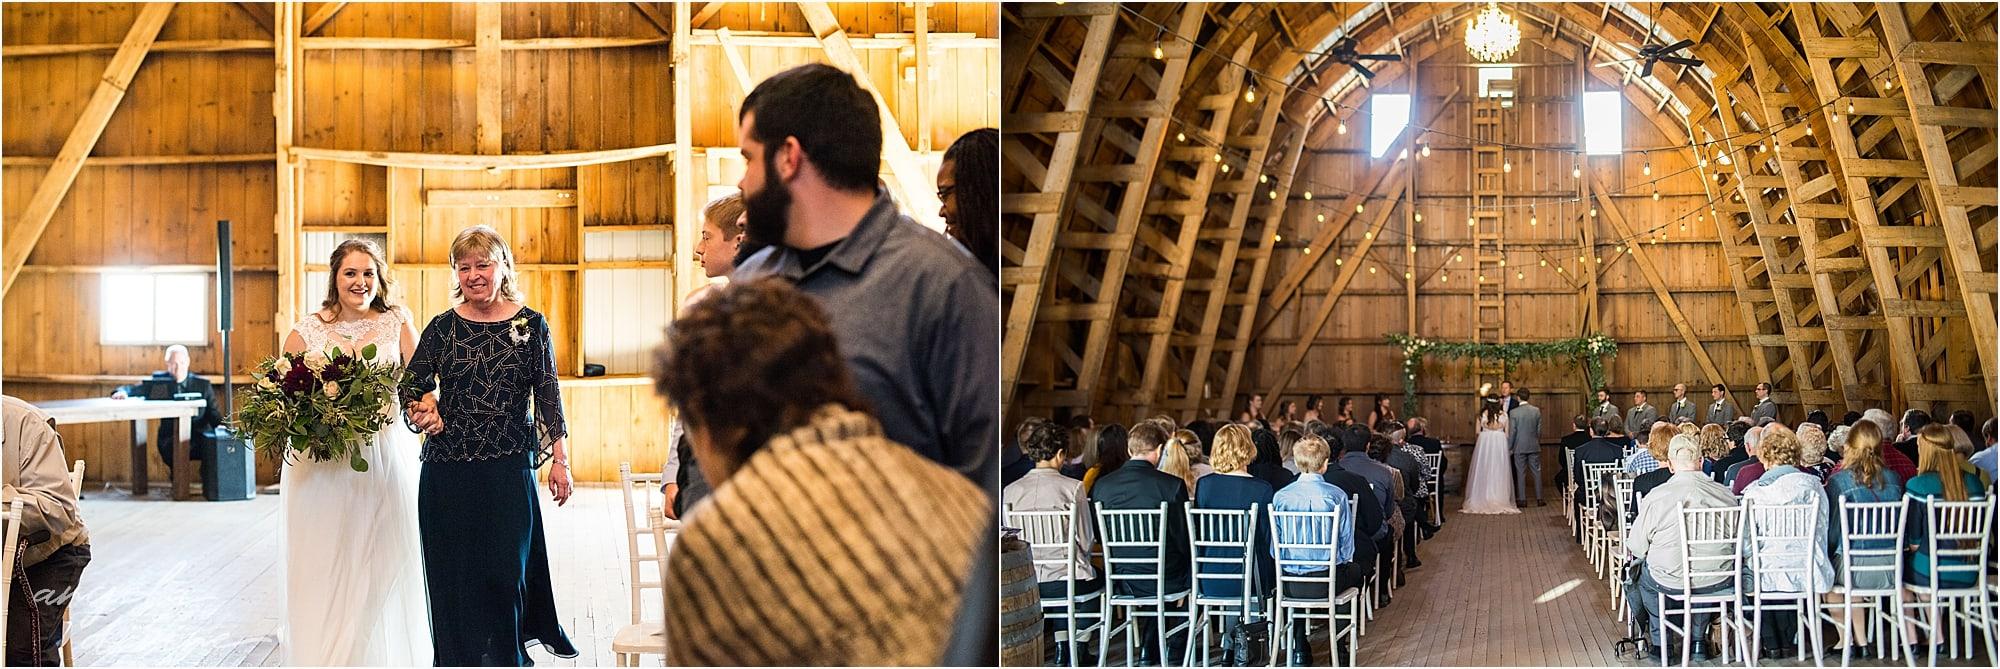 The Cottage Farmhouse Wedding Ceremony